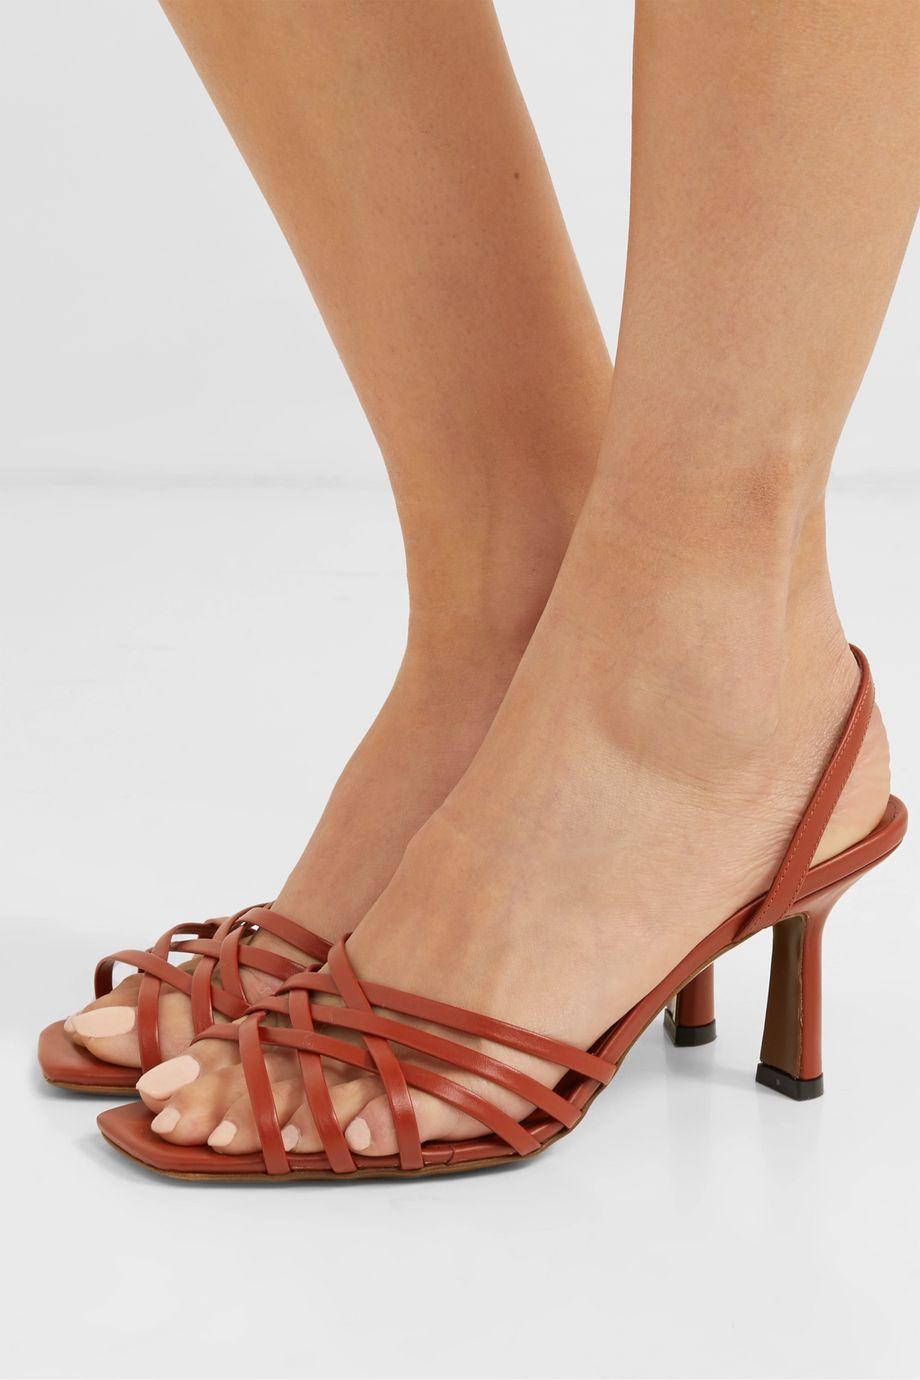 Neous Scuticaria leather slingback sandals